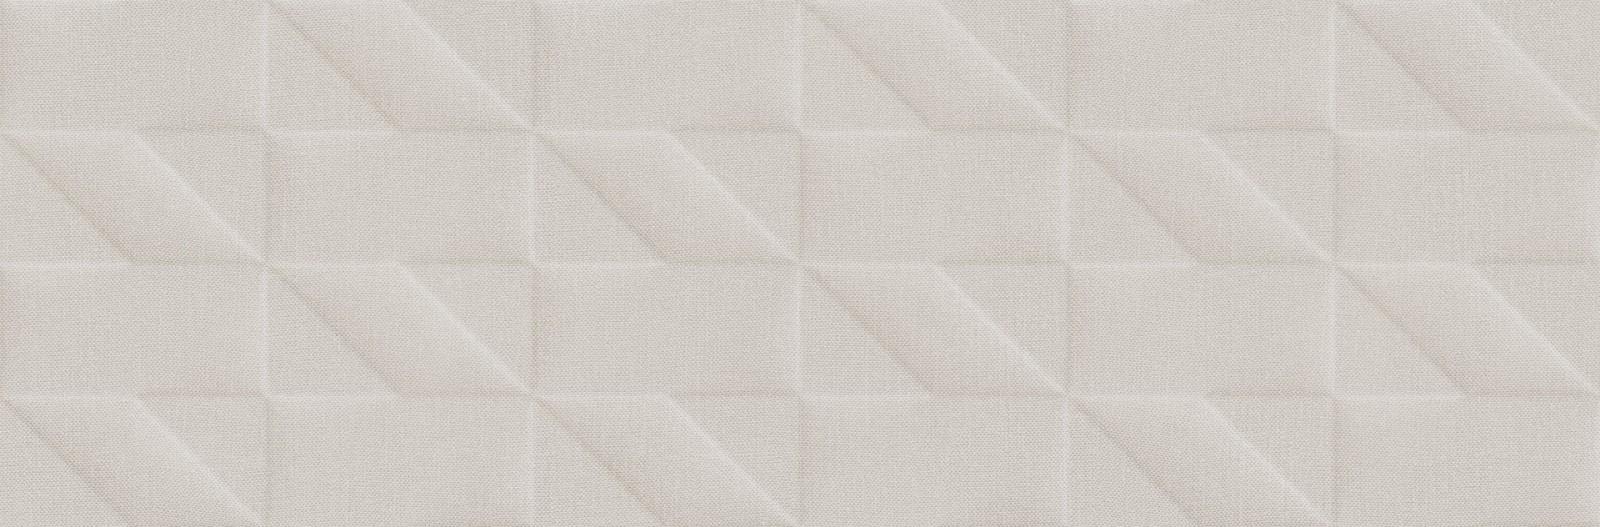 Стенни плочки Outfit Grey Struttura Tetris 3D 25x76